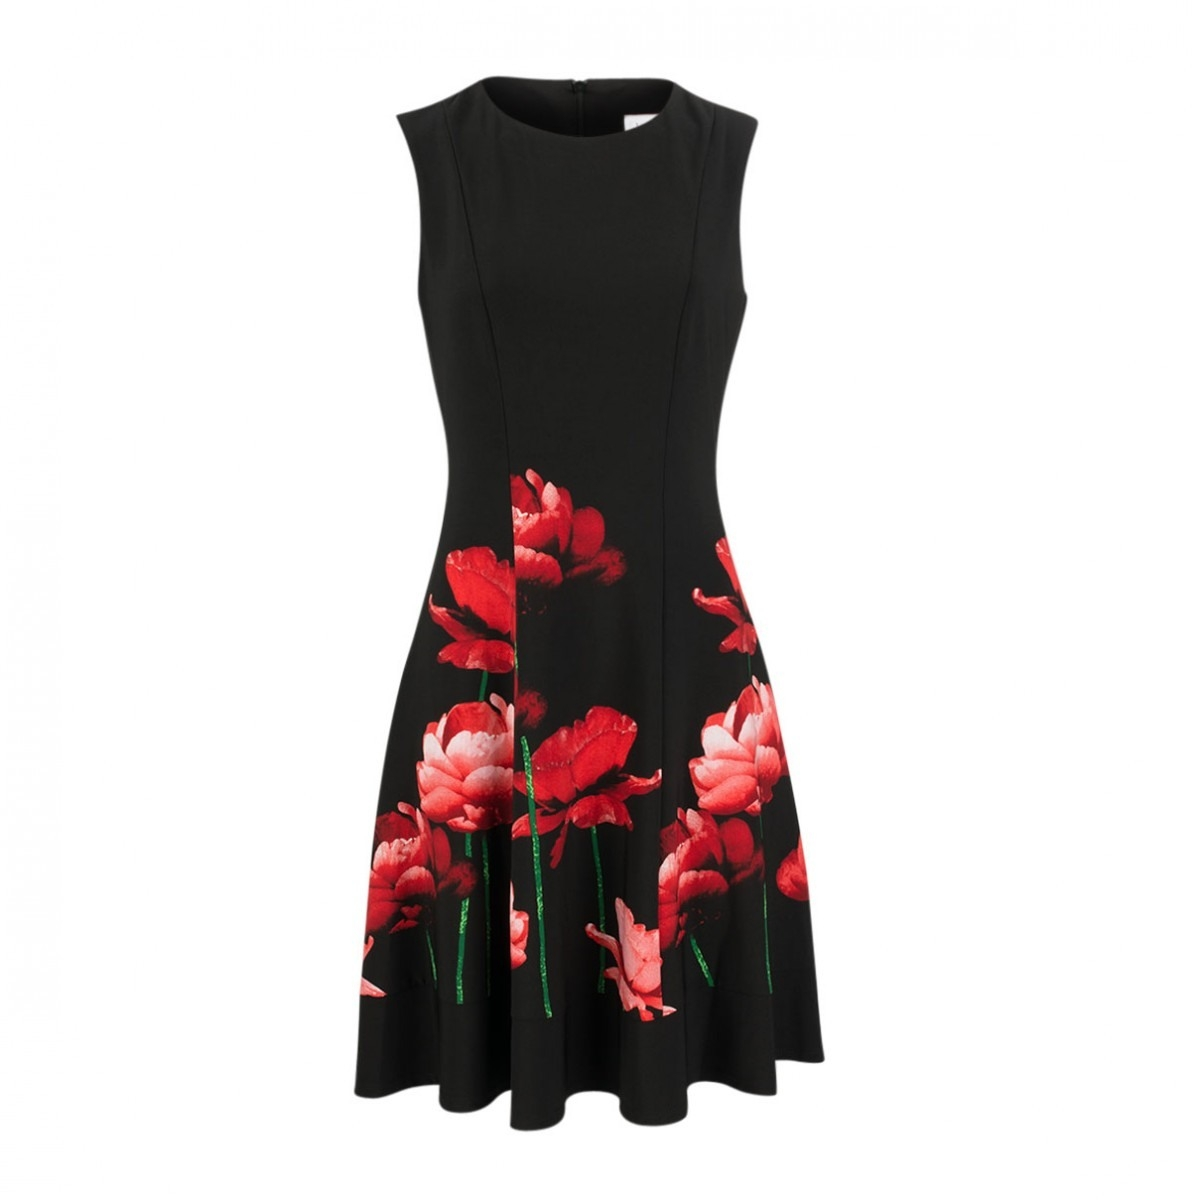 Abend Einzigartig A Form Kleid VertriebFormal Perfekt A Form Kleid Design